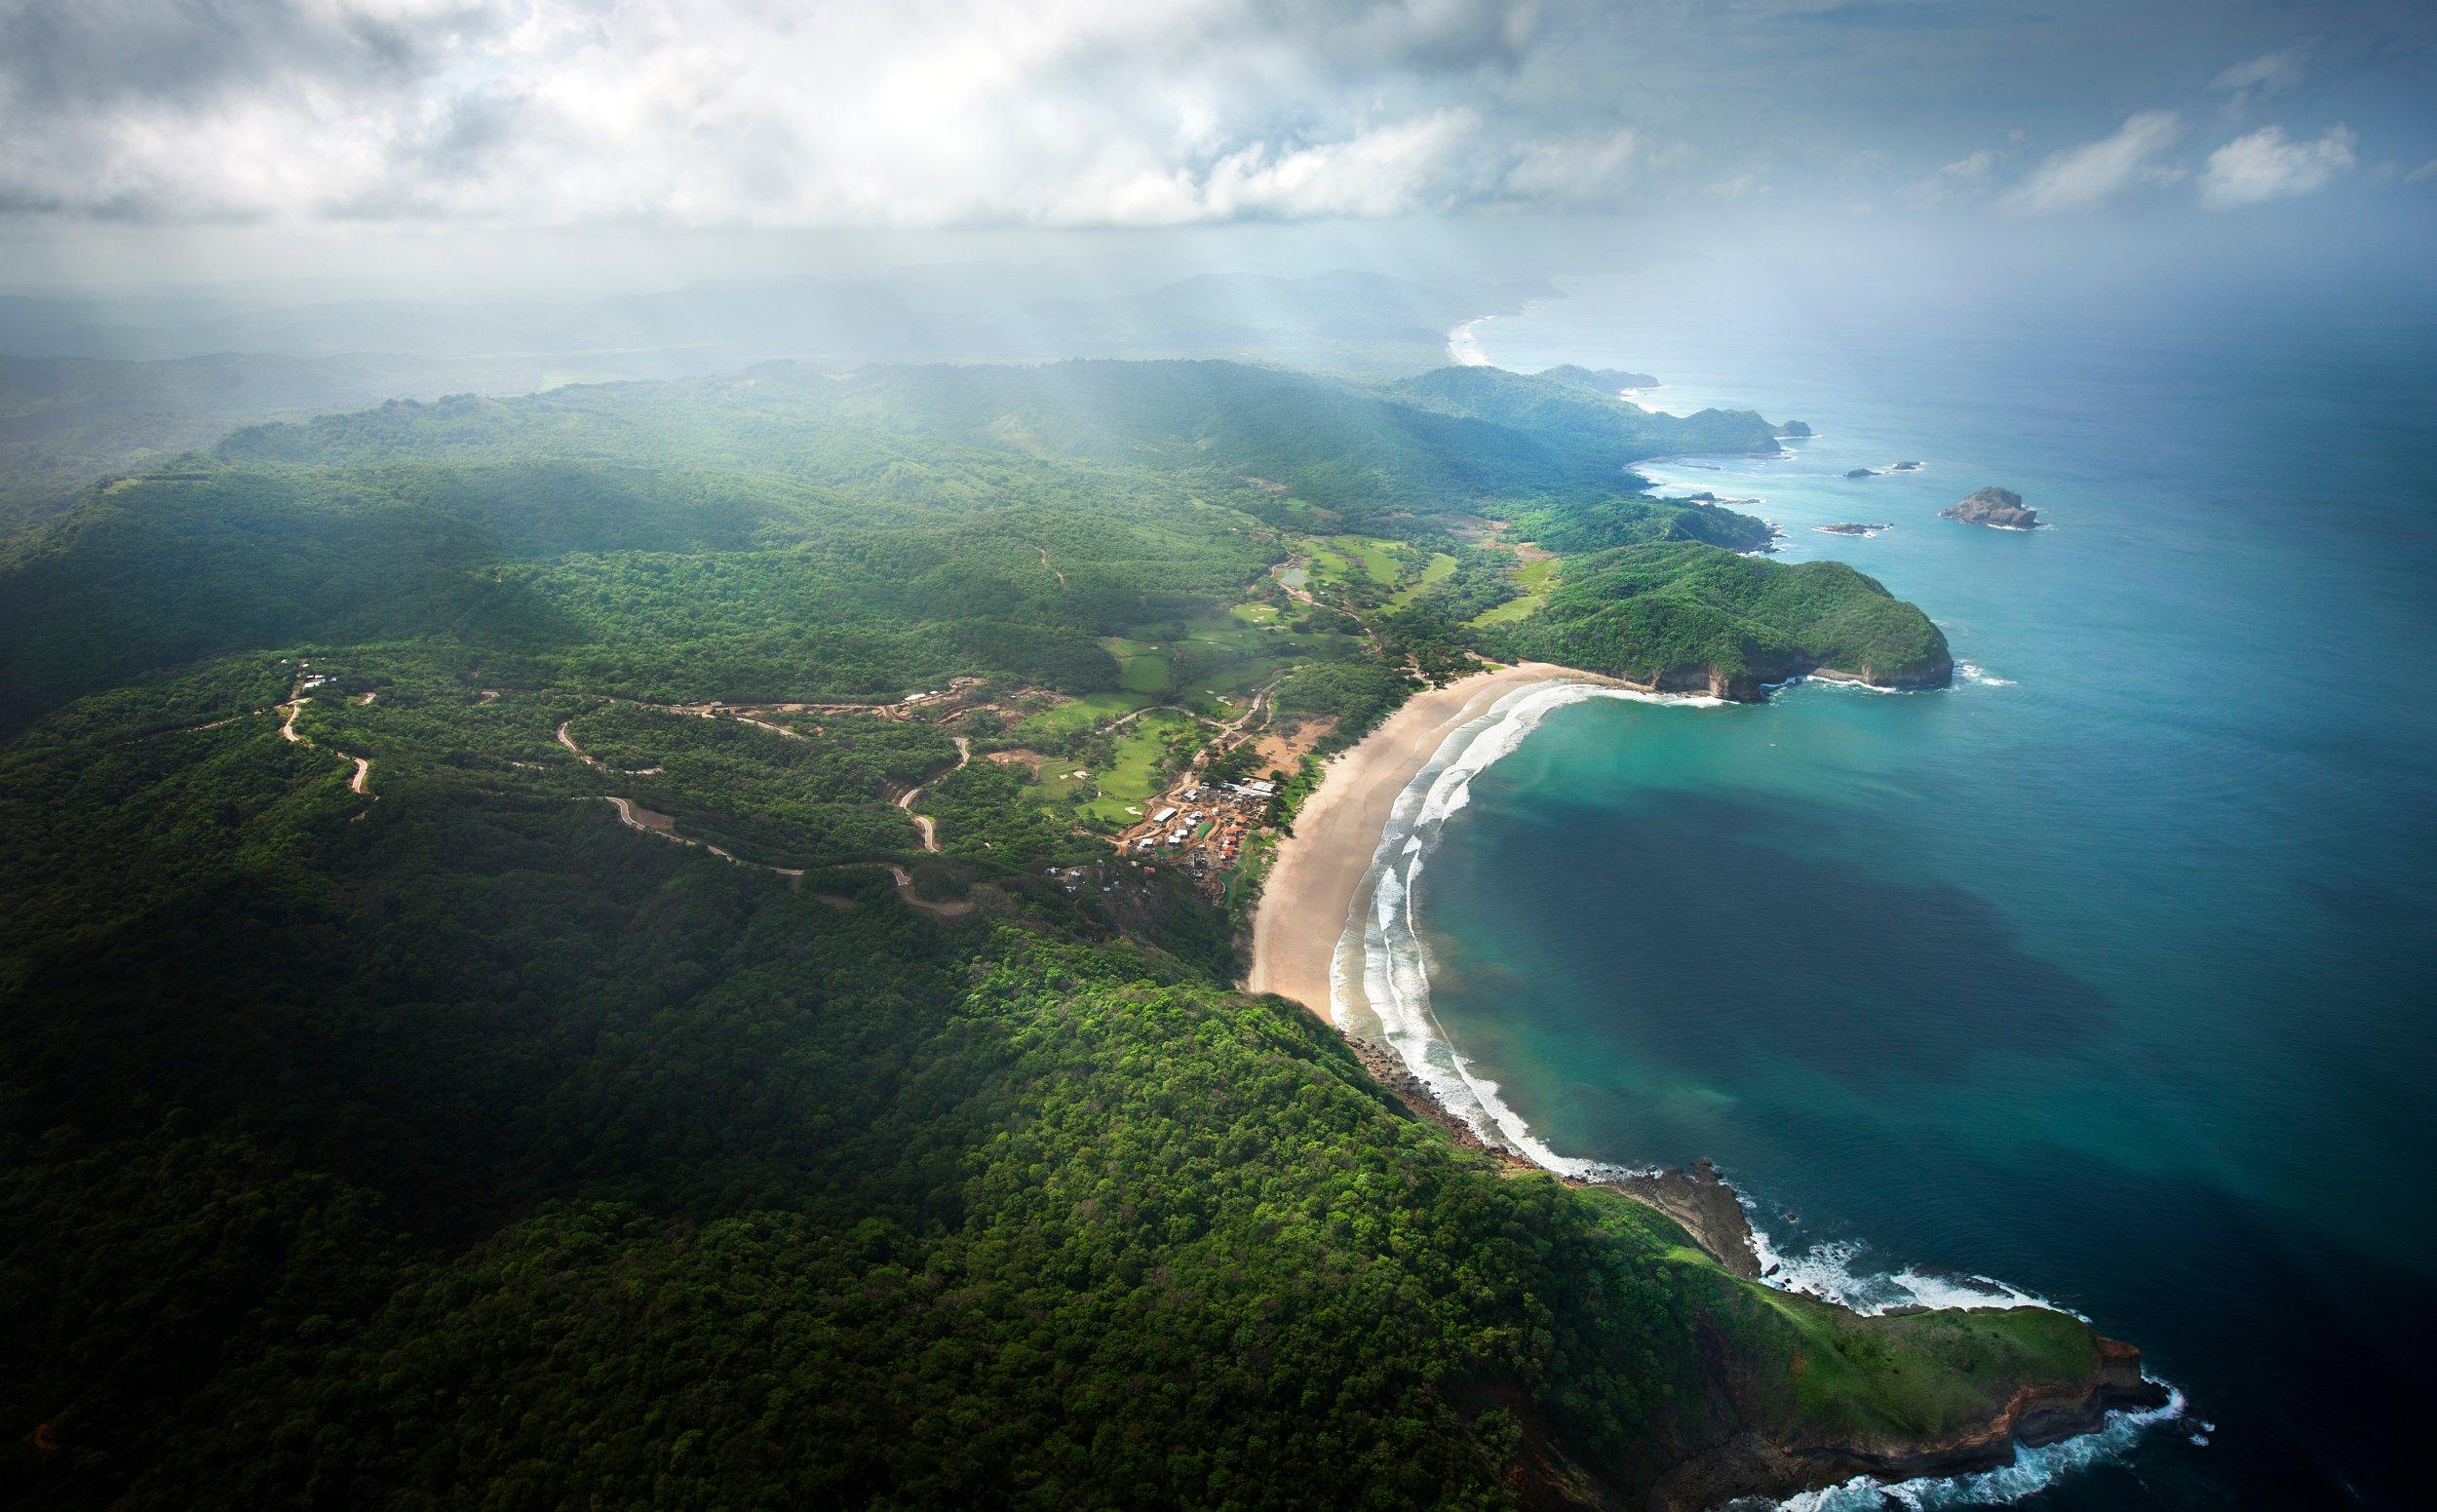 Nicaragua cover image